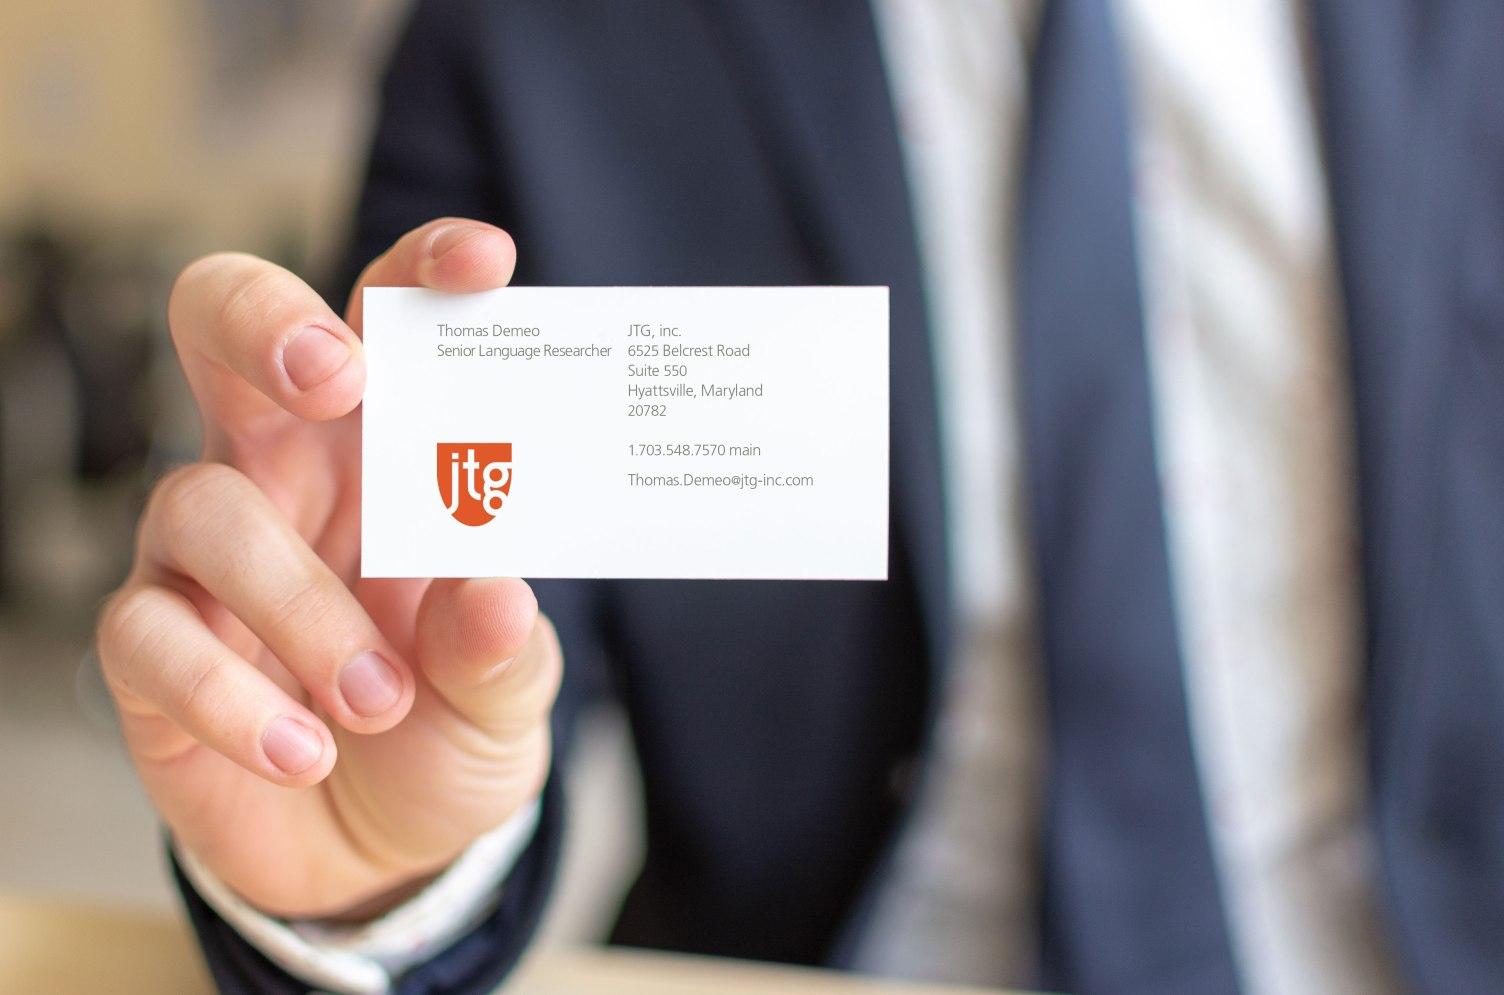 JTG, inc. business card